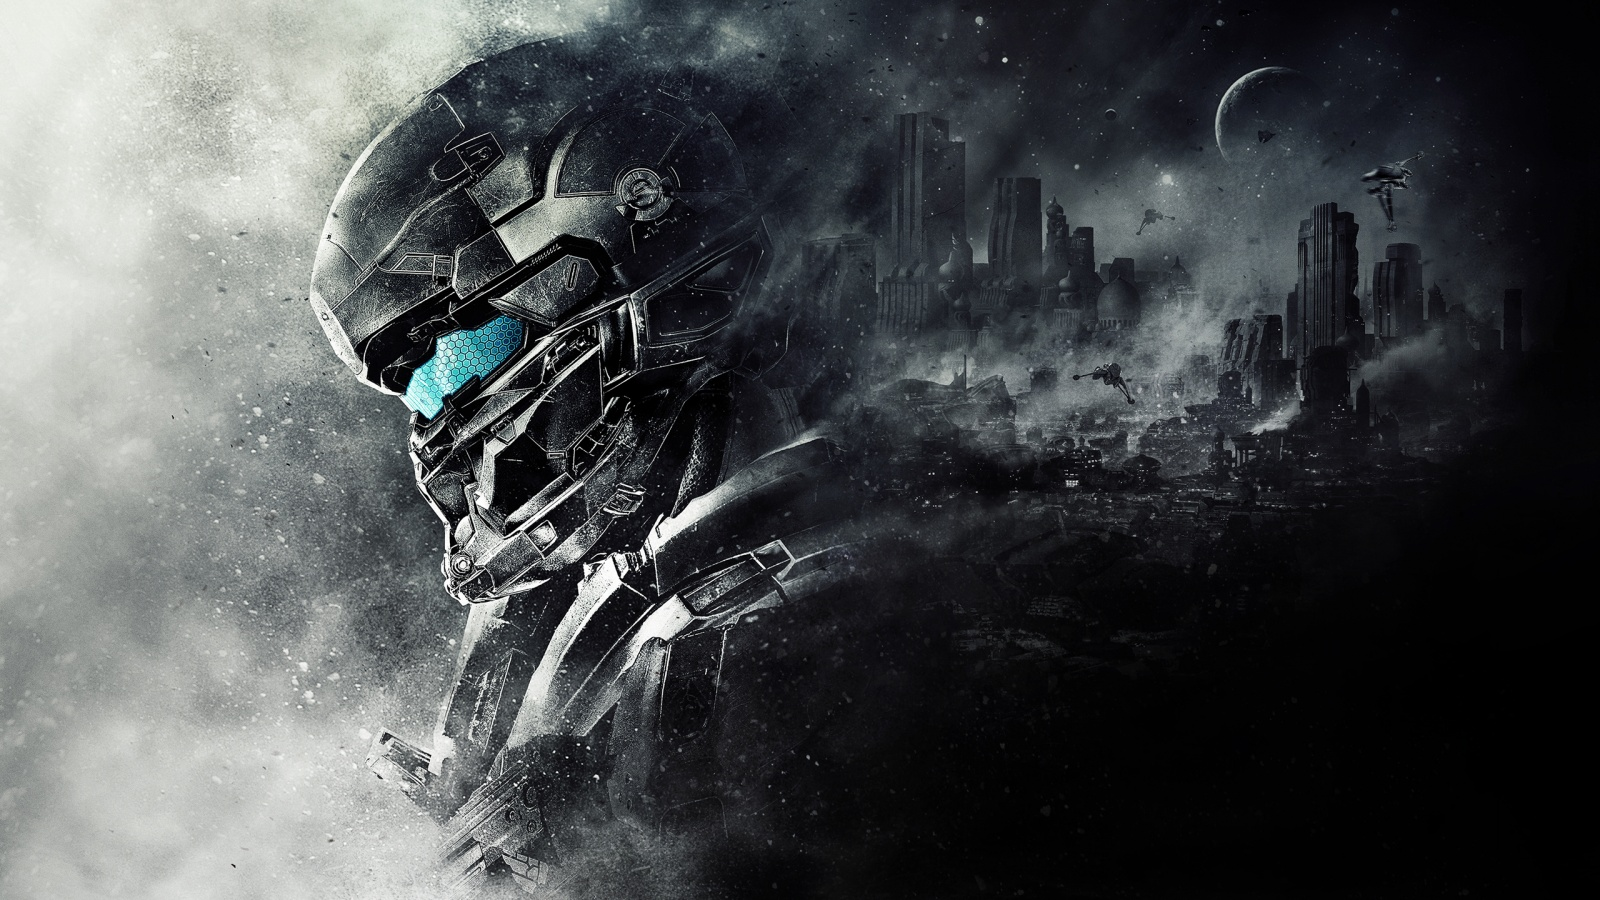 Spartan Locke Halo 5 Guardians Wallpapers HD Wallpapers 1600x900